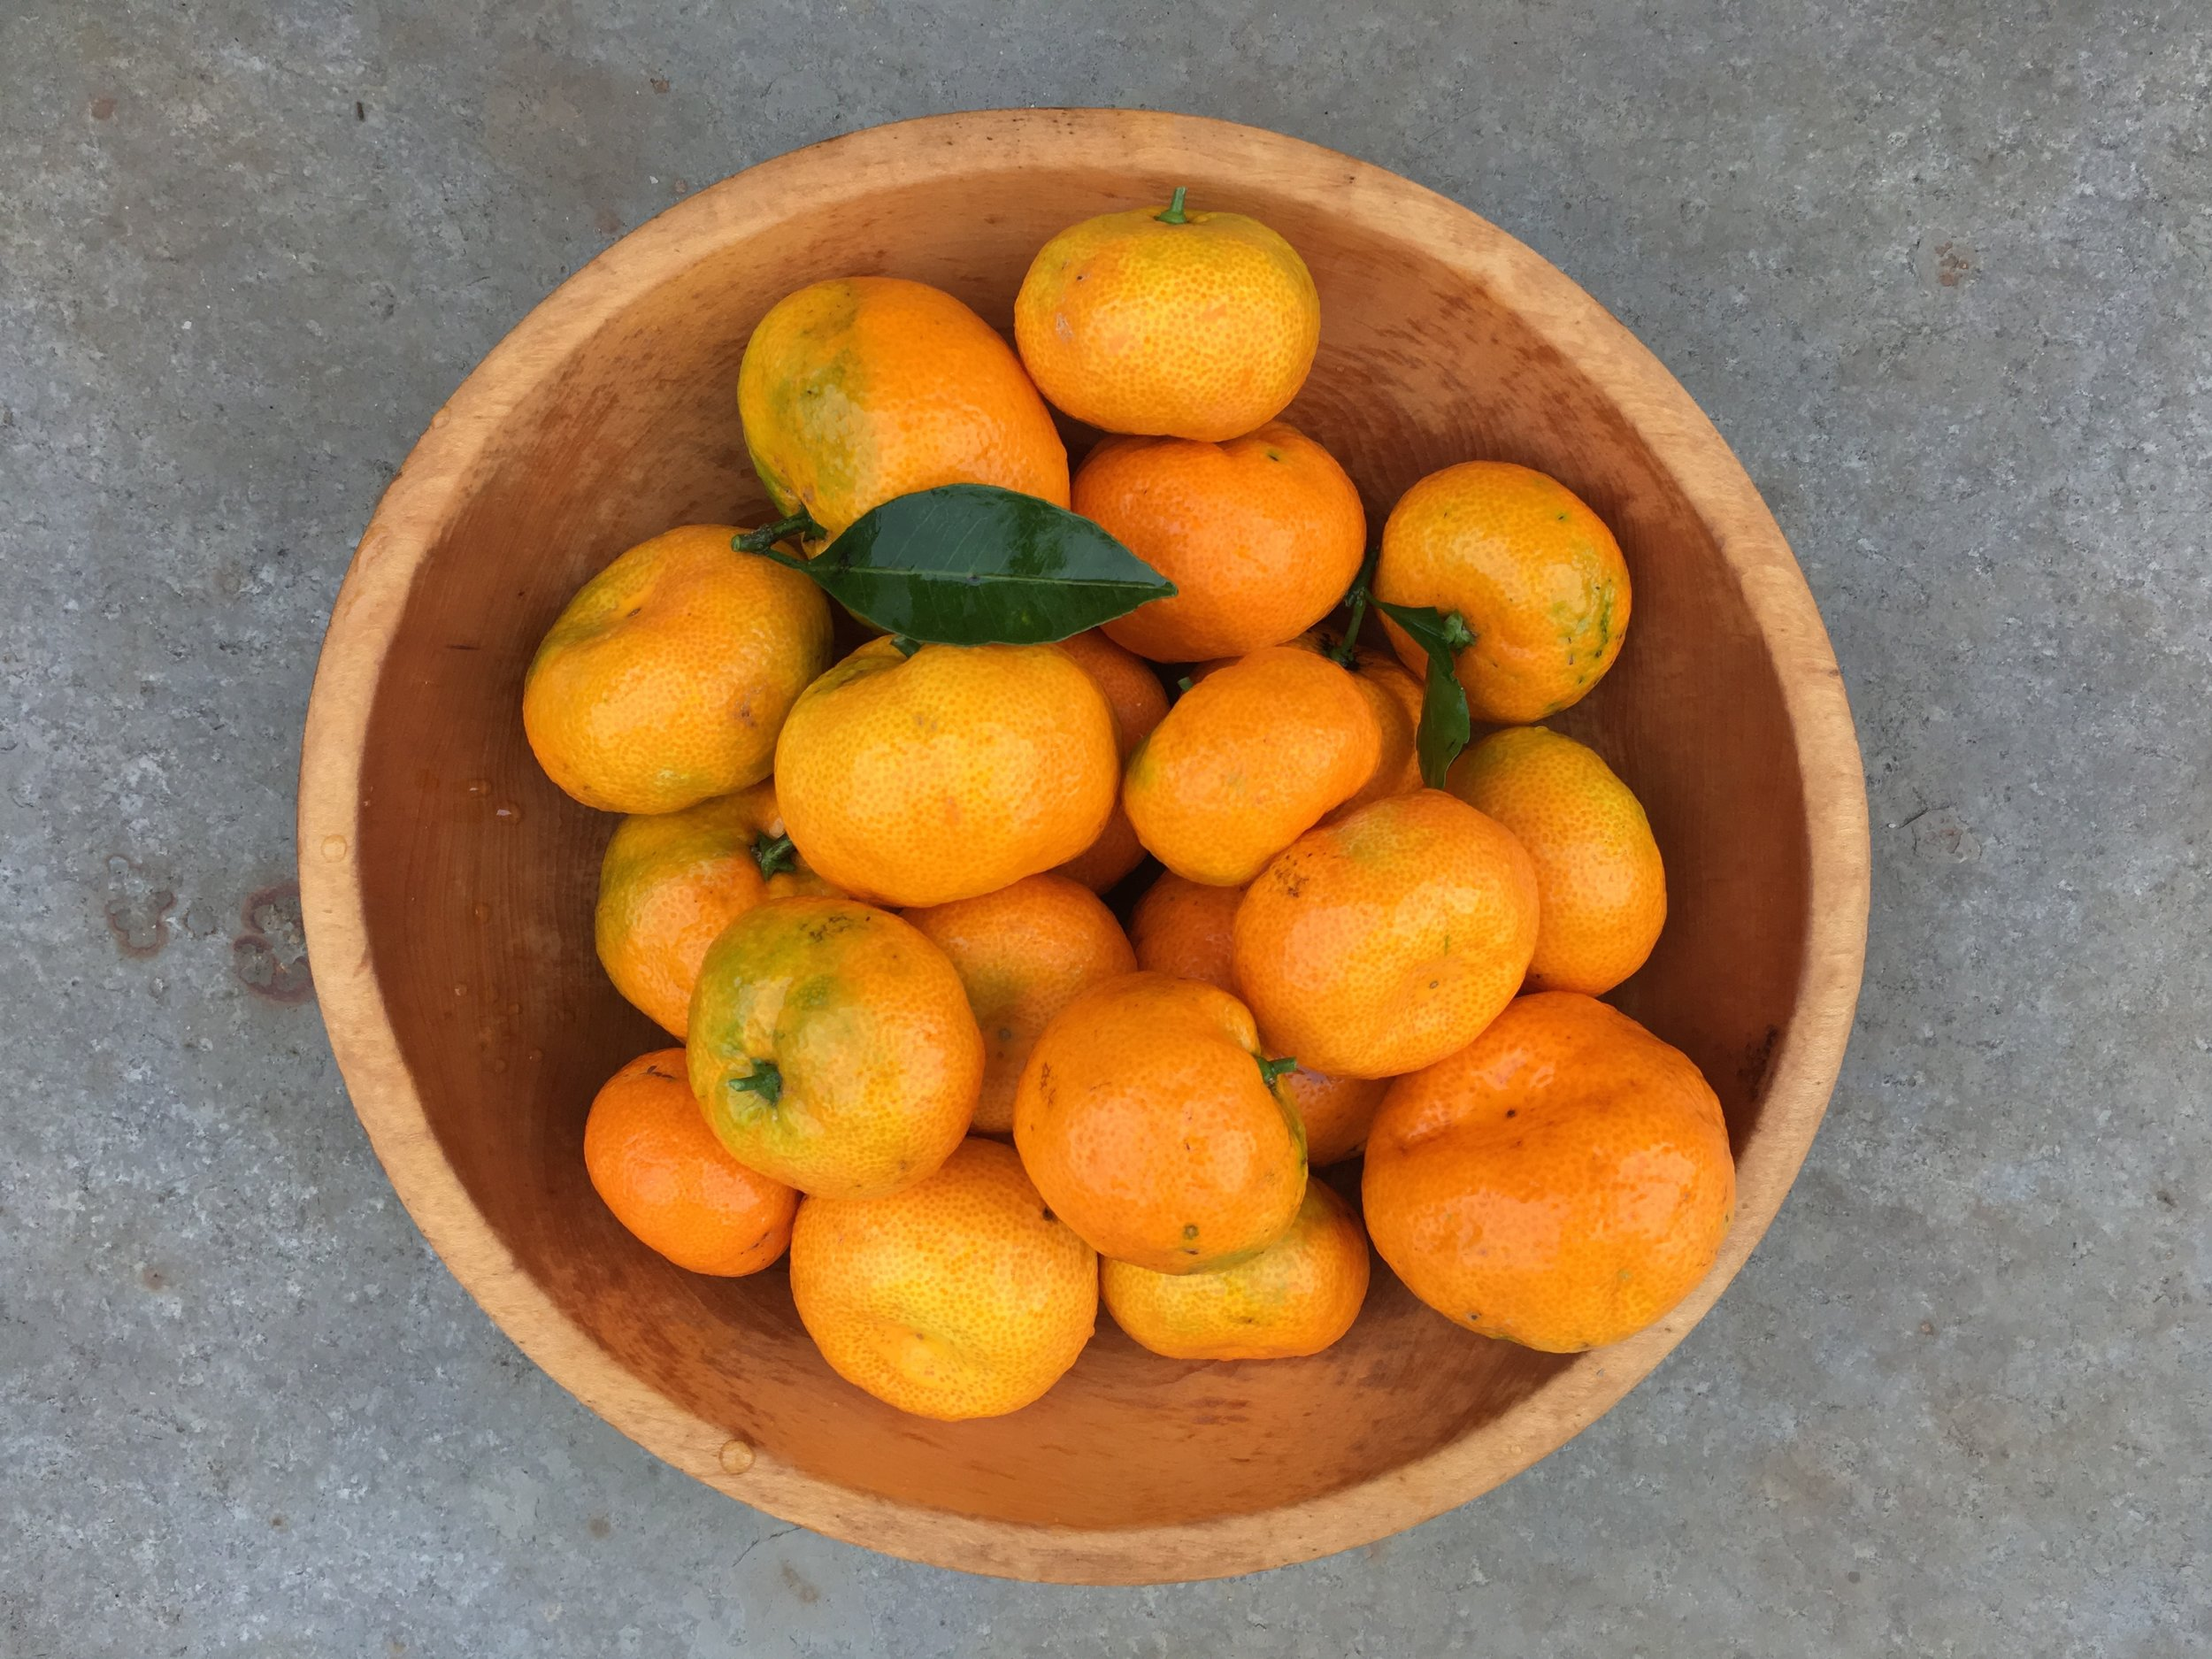 'Satsuma' tangerines